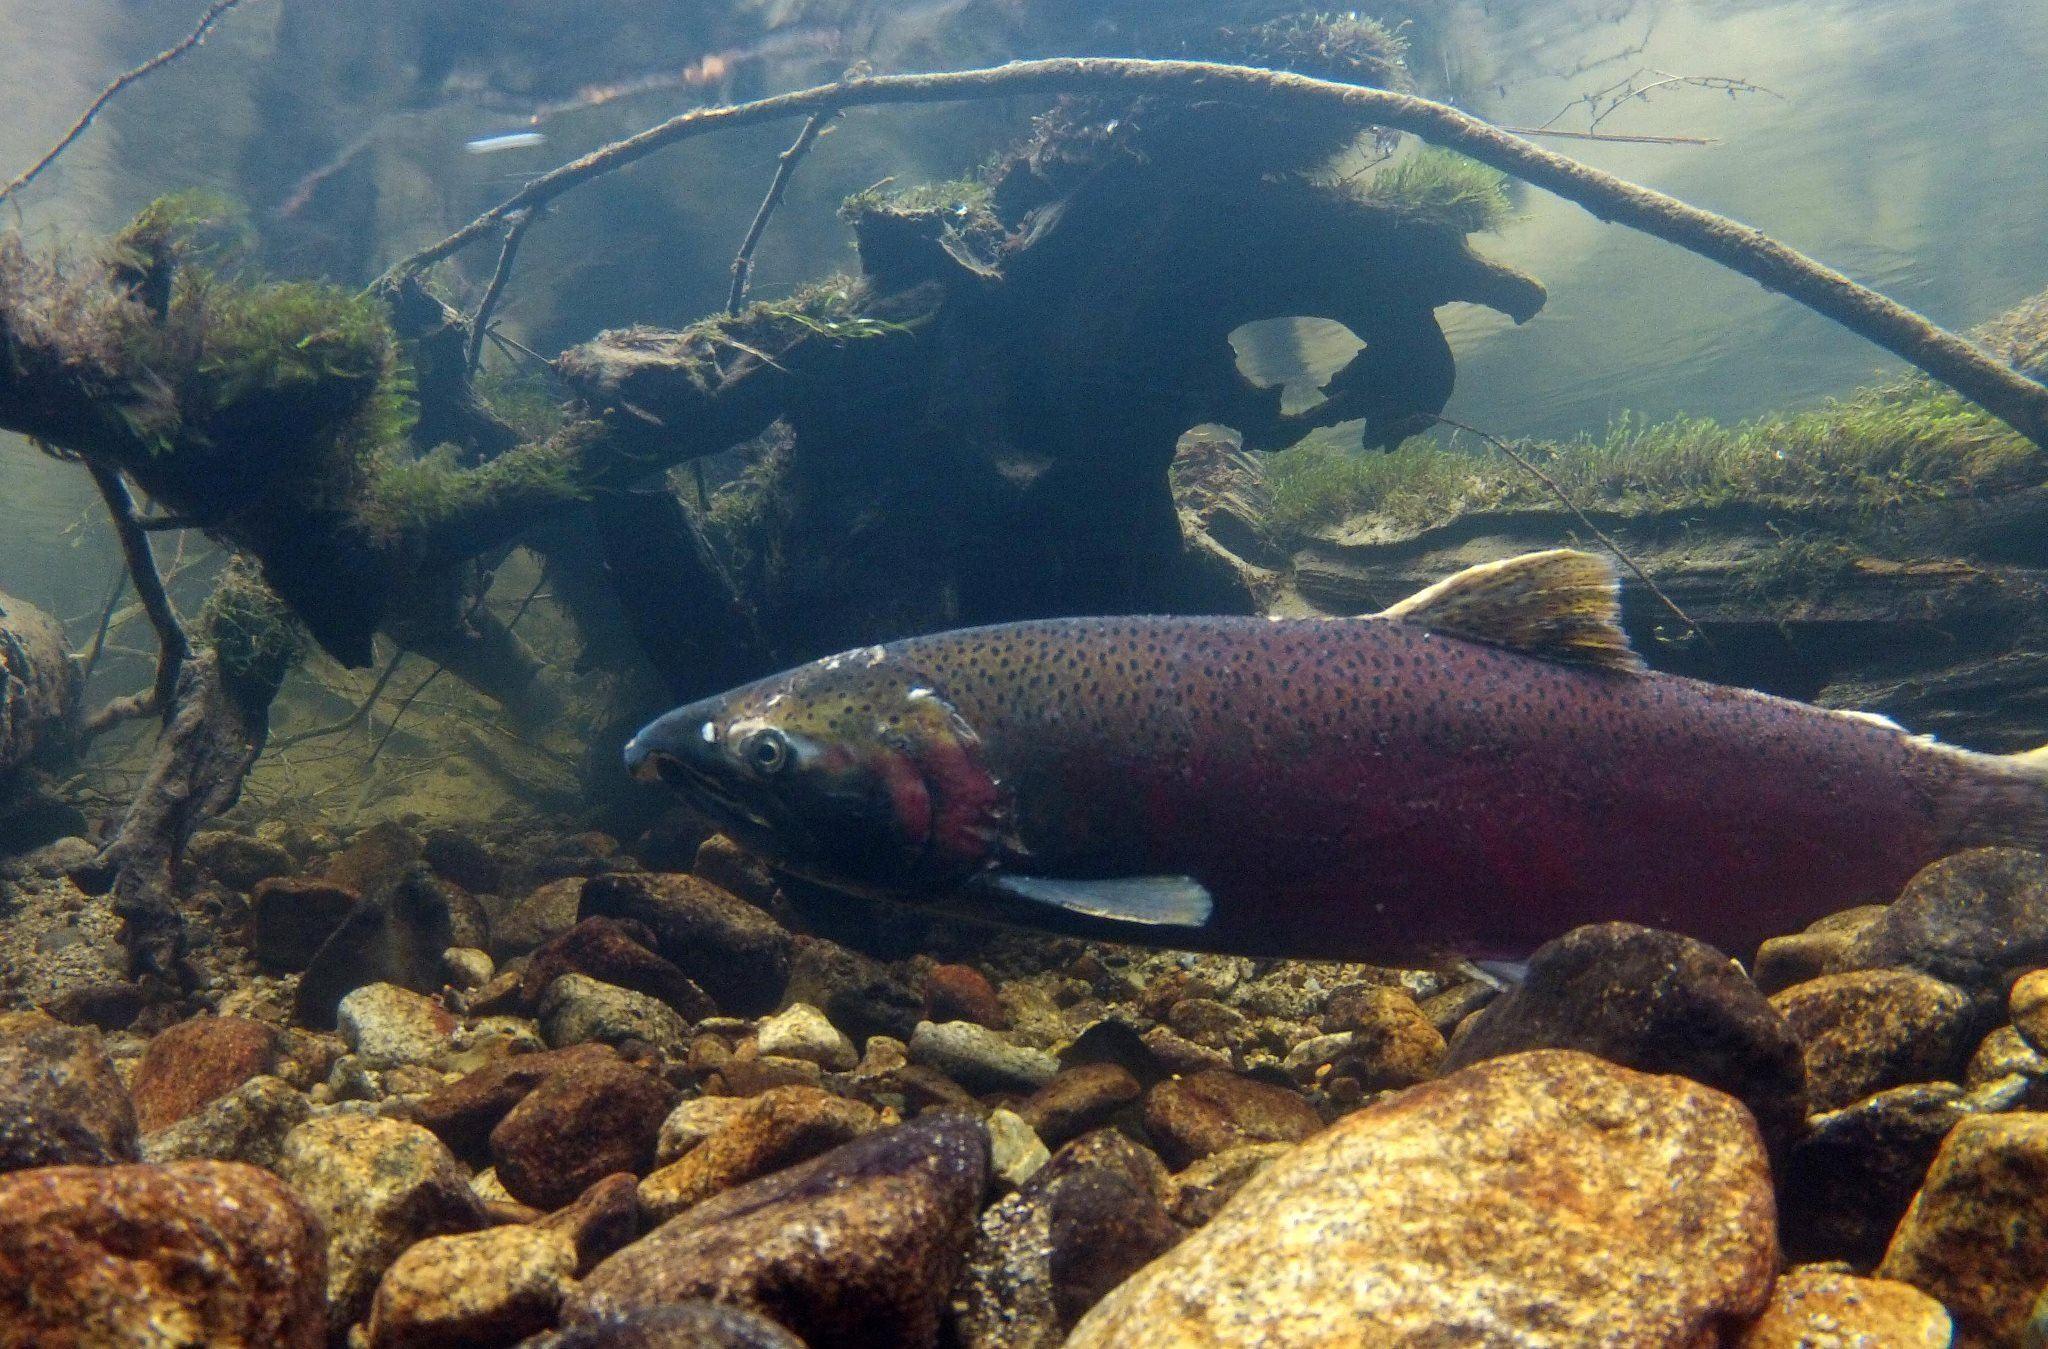 Salmon (Seymour Salmonid Society)